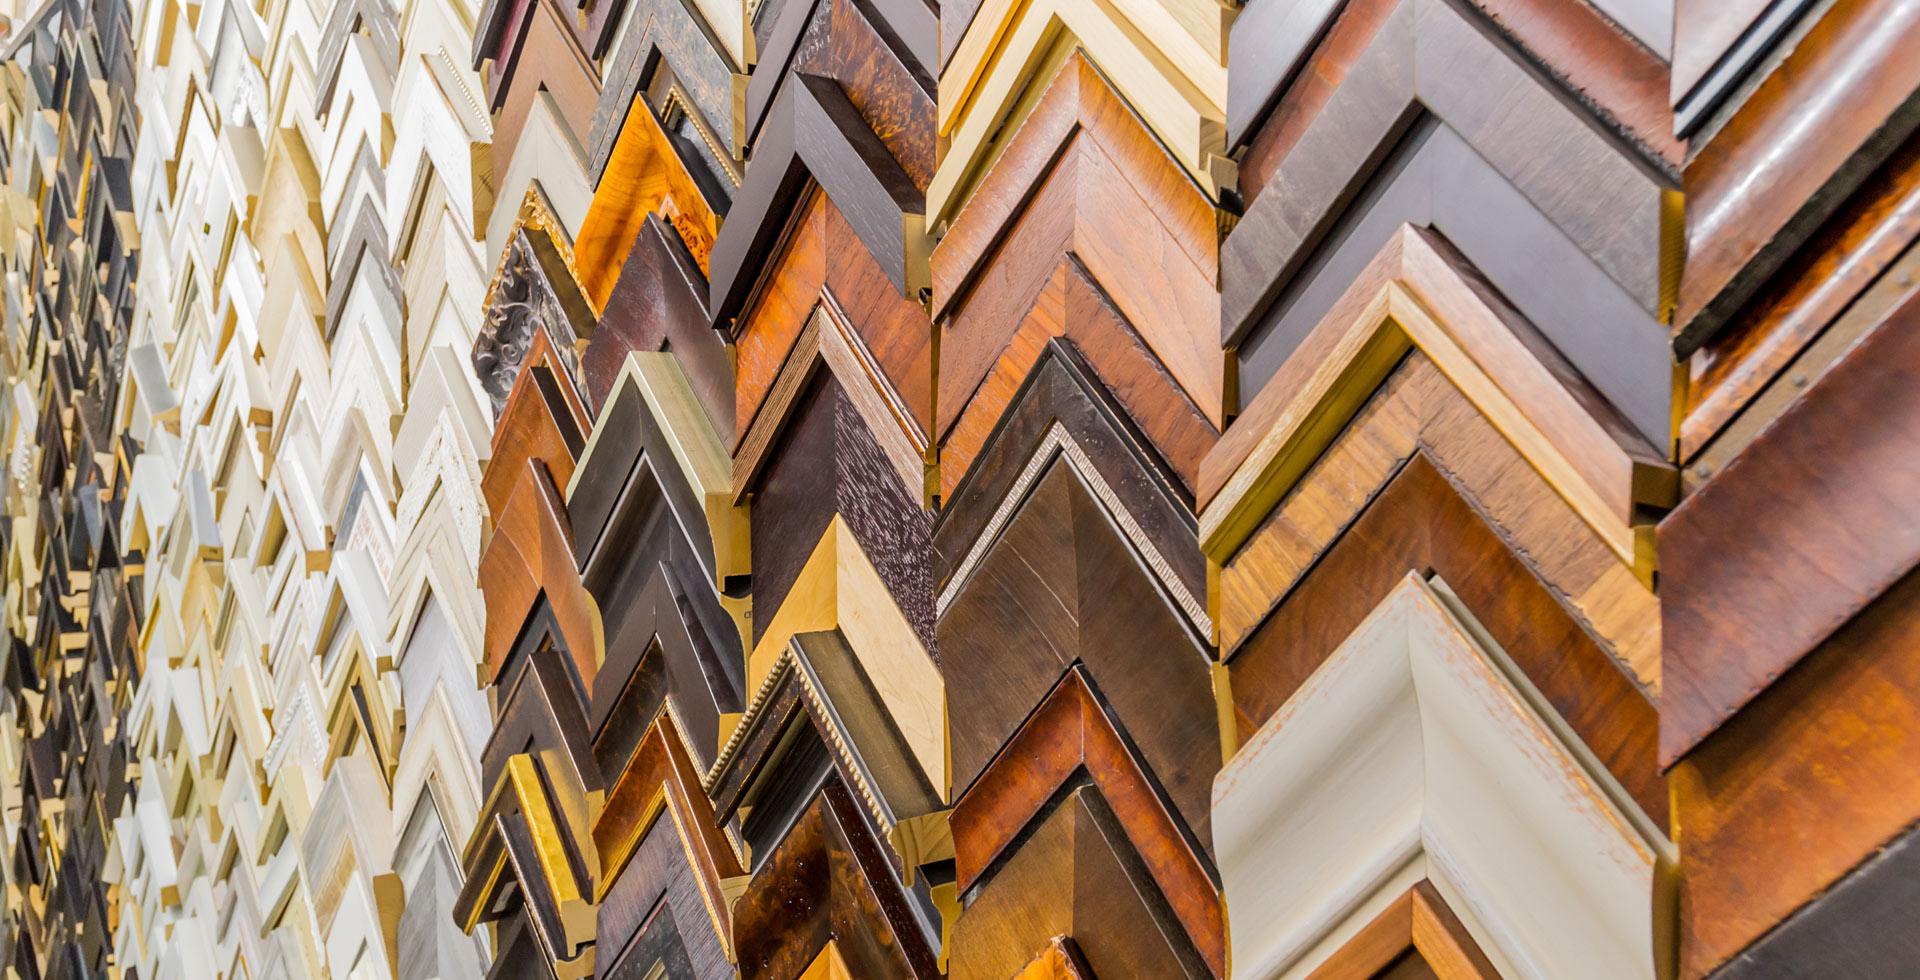 Custom Framing Styles | Aldecor Custom Framing & Gallery - Naples, Florida